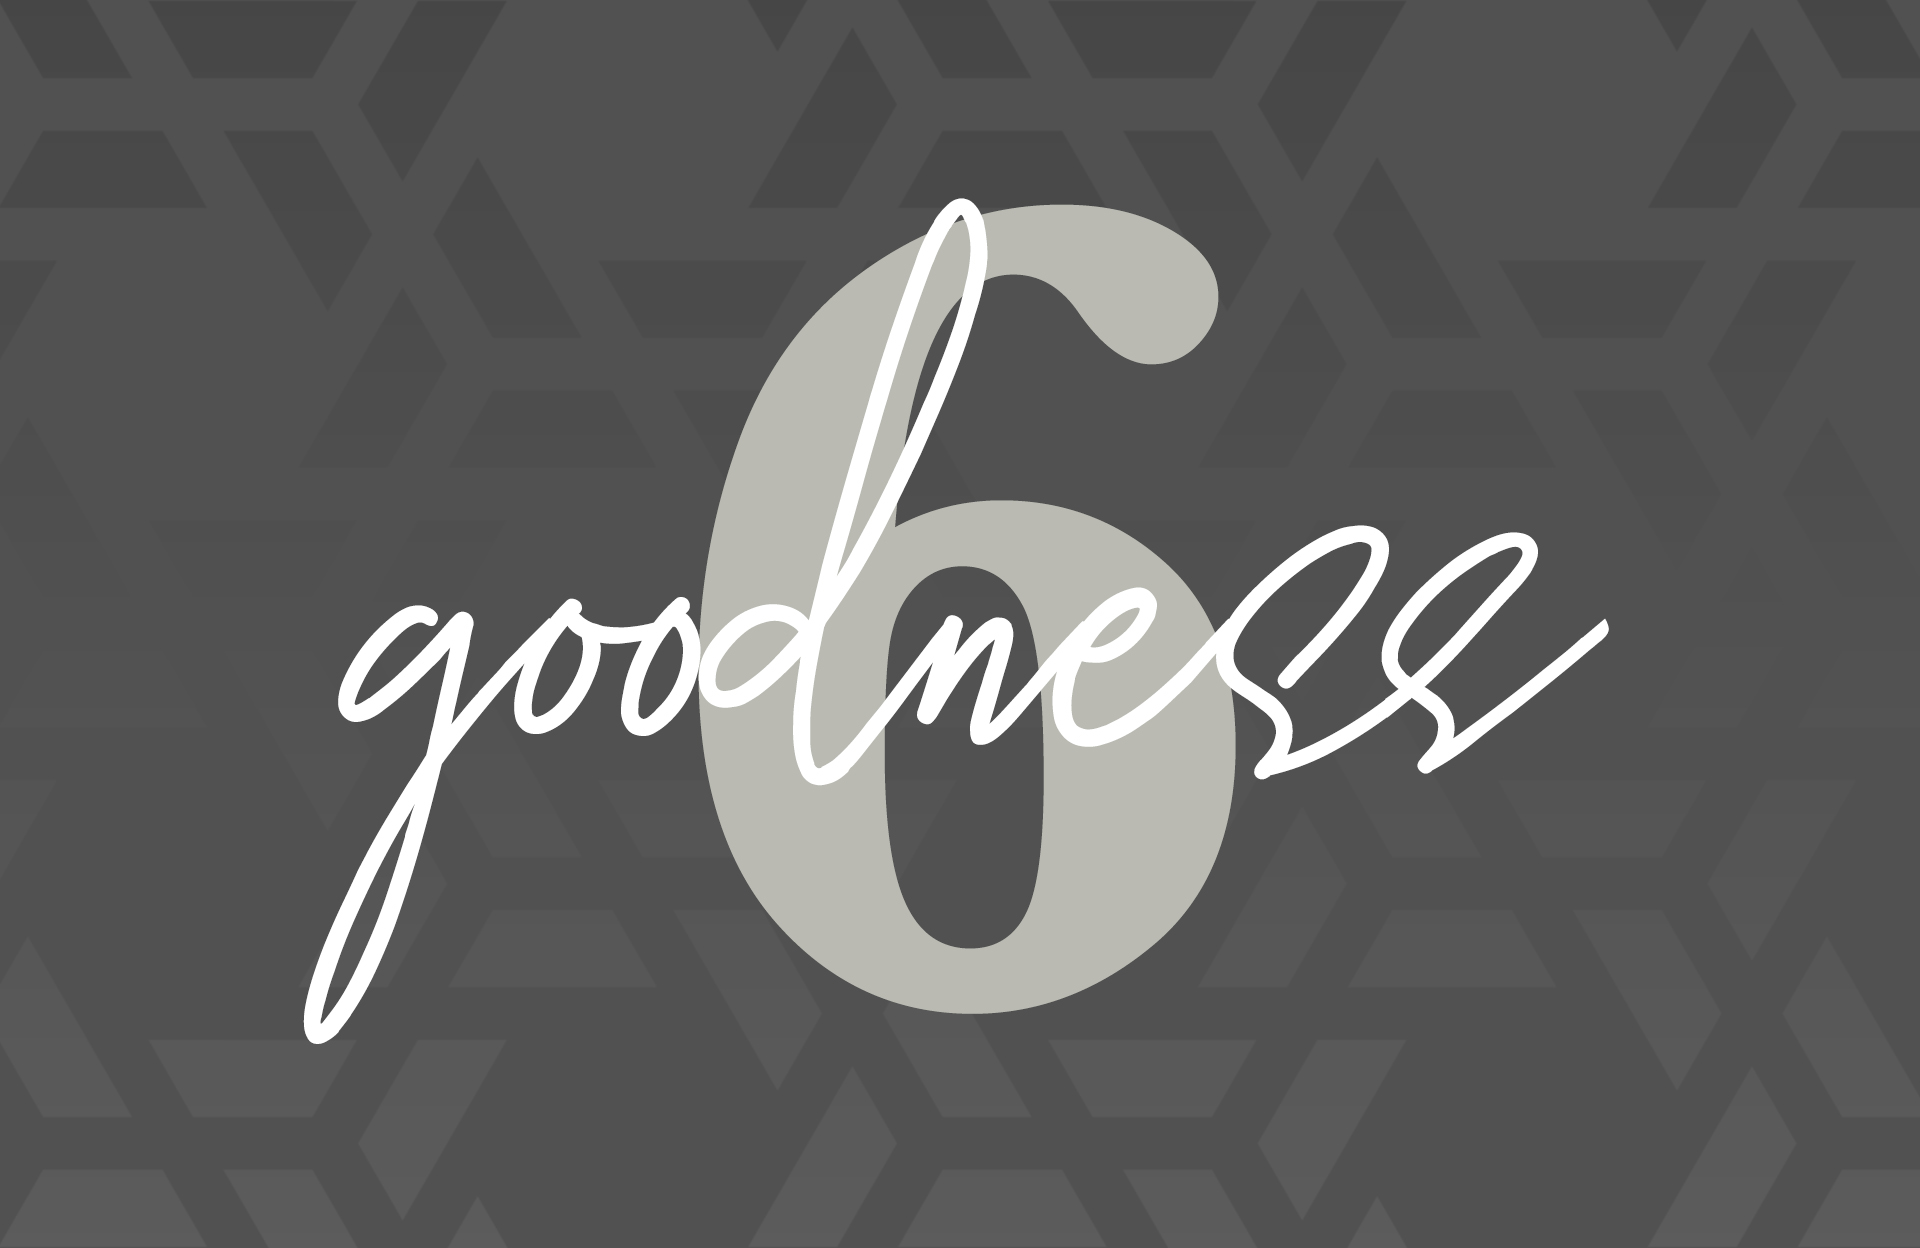 Day Six: Goodness